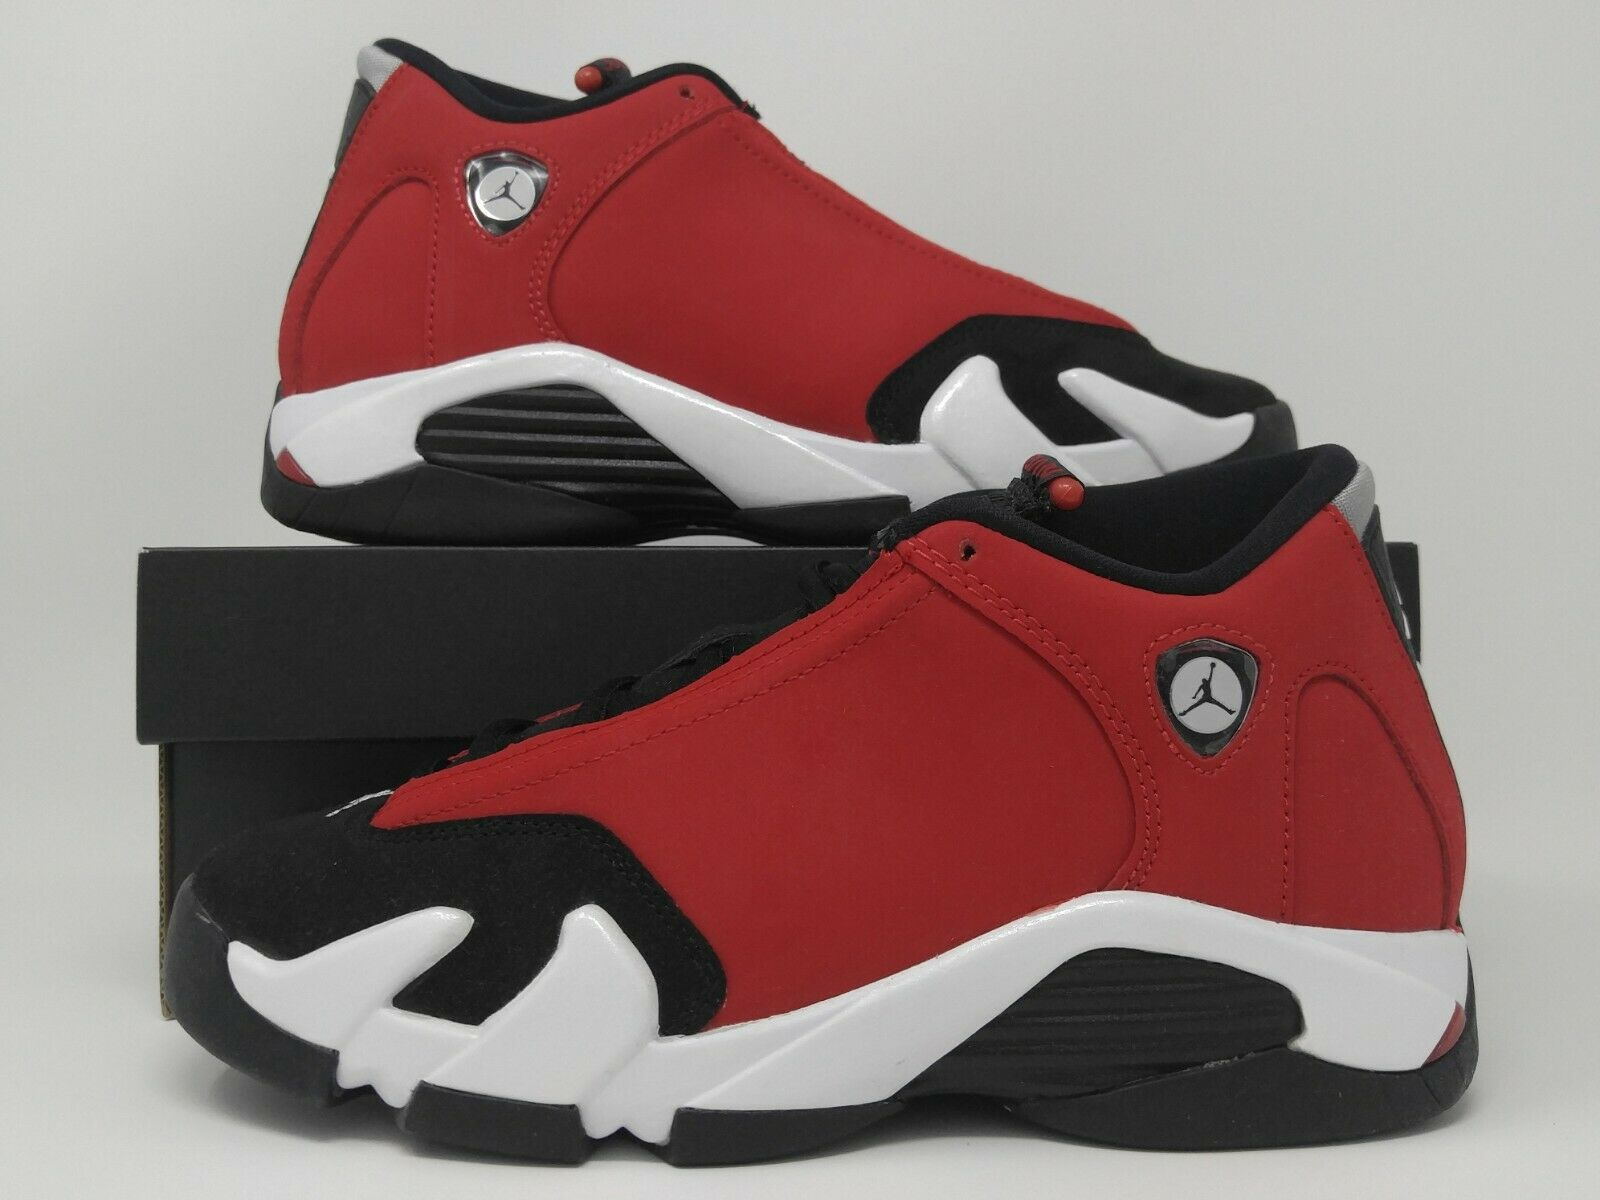 Jordan 14 Retro Gym Red Toro GS